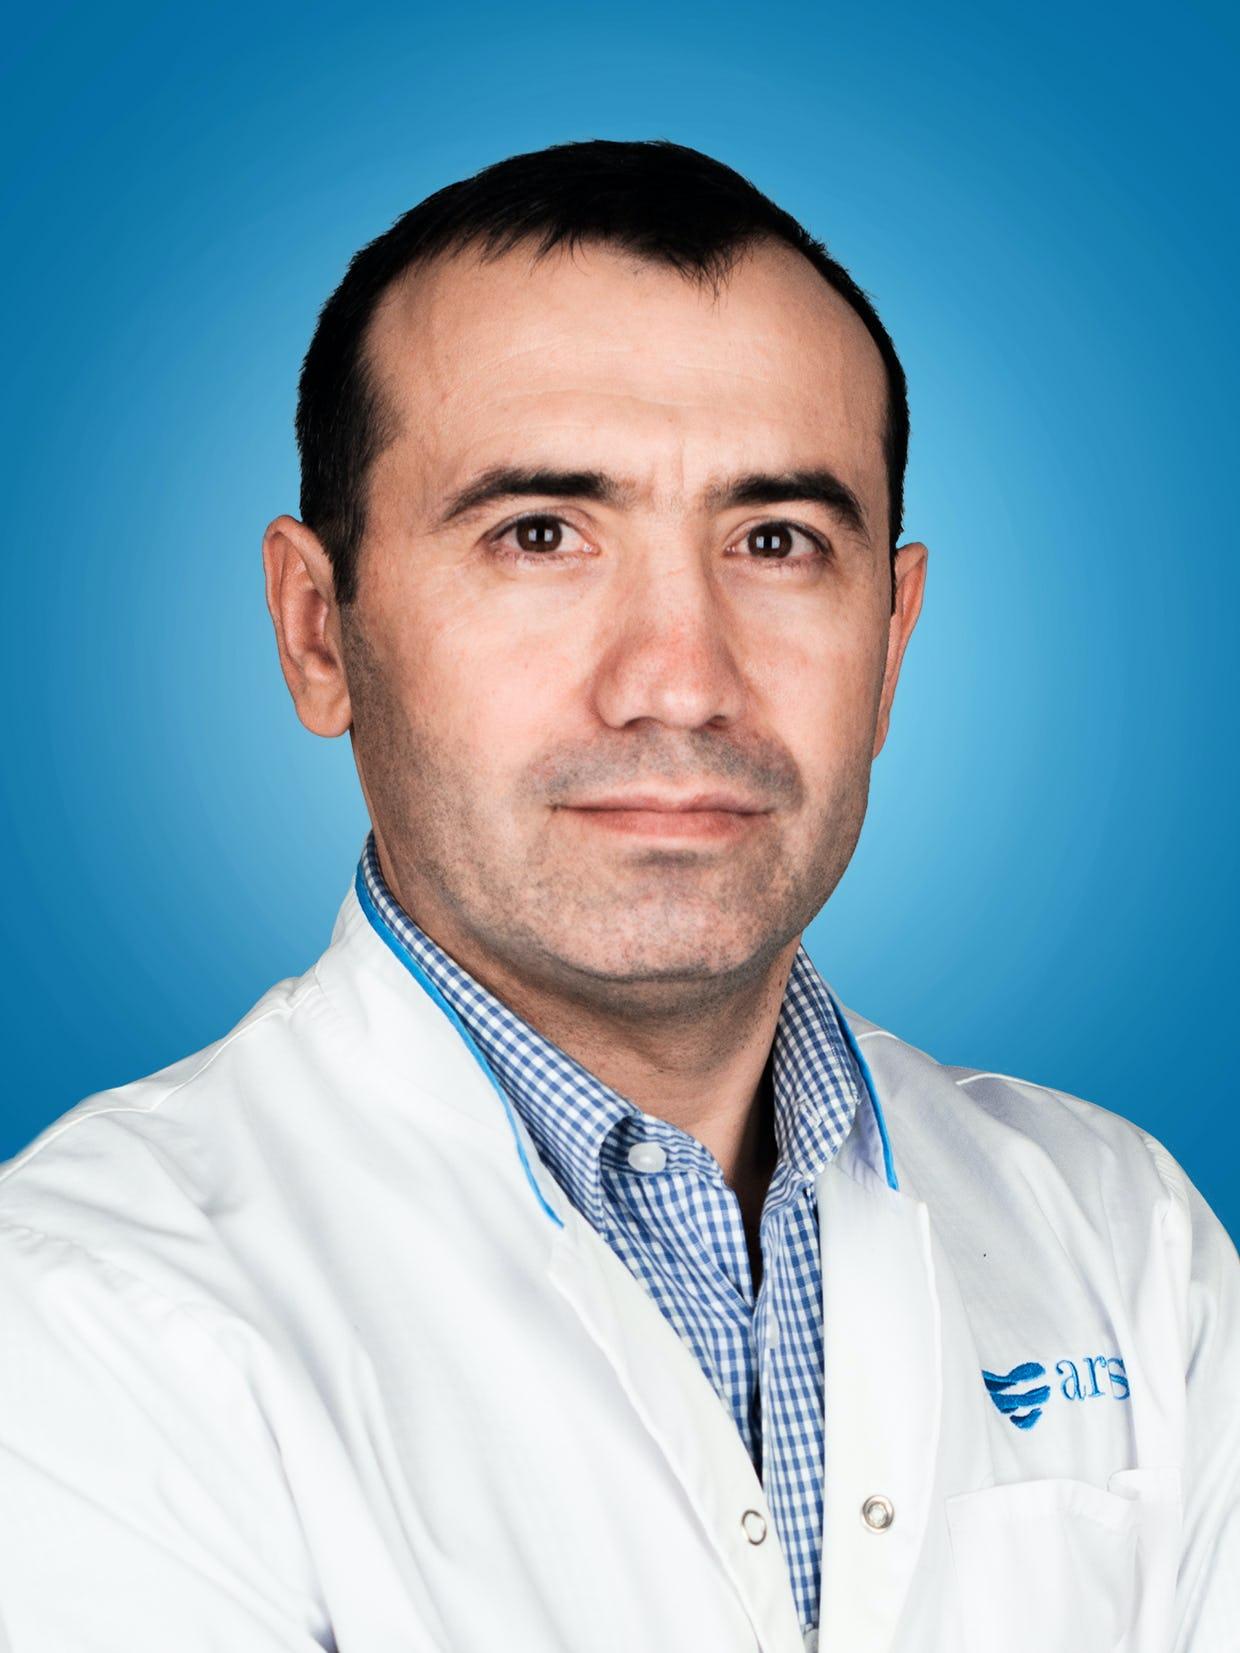 Doctor Pavel Platon, medic primar cardiolog la Centrele Ares